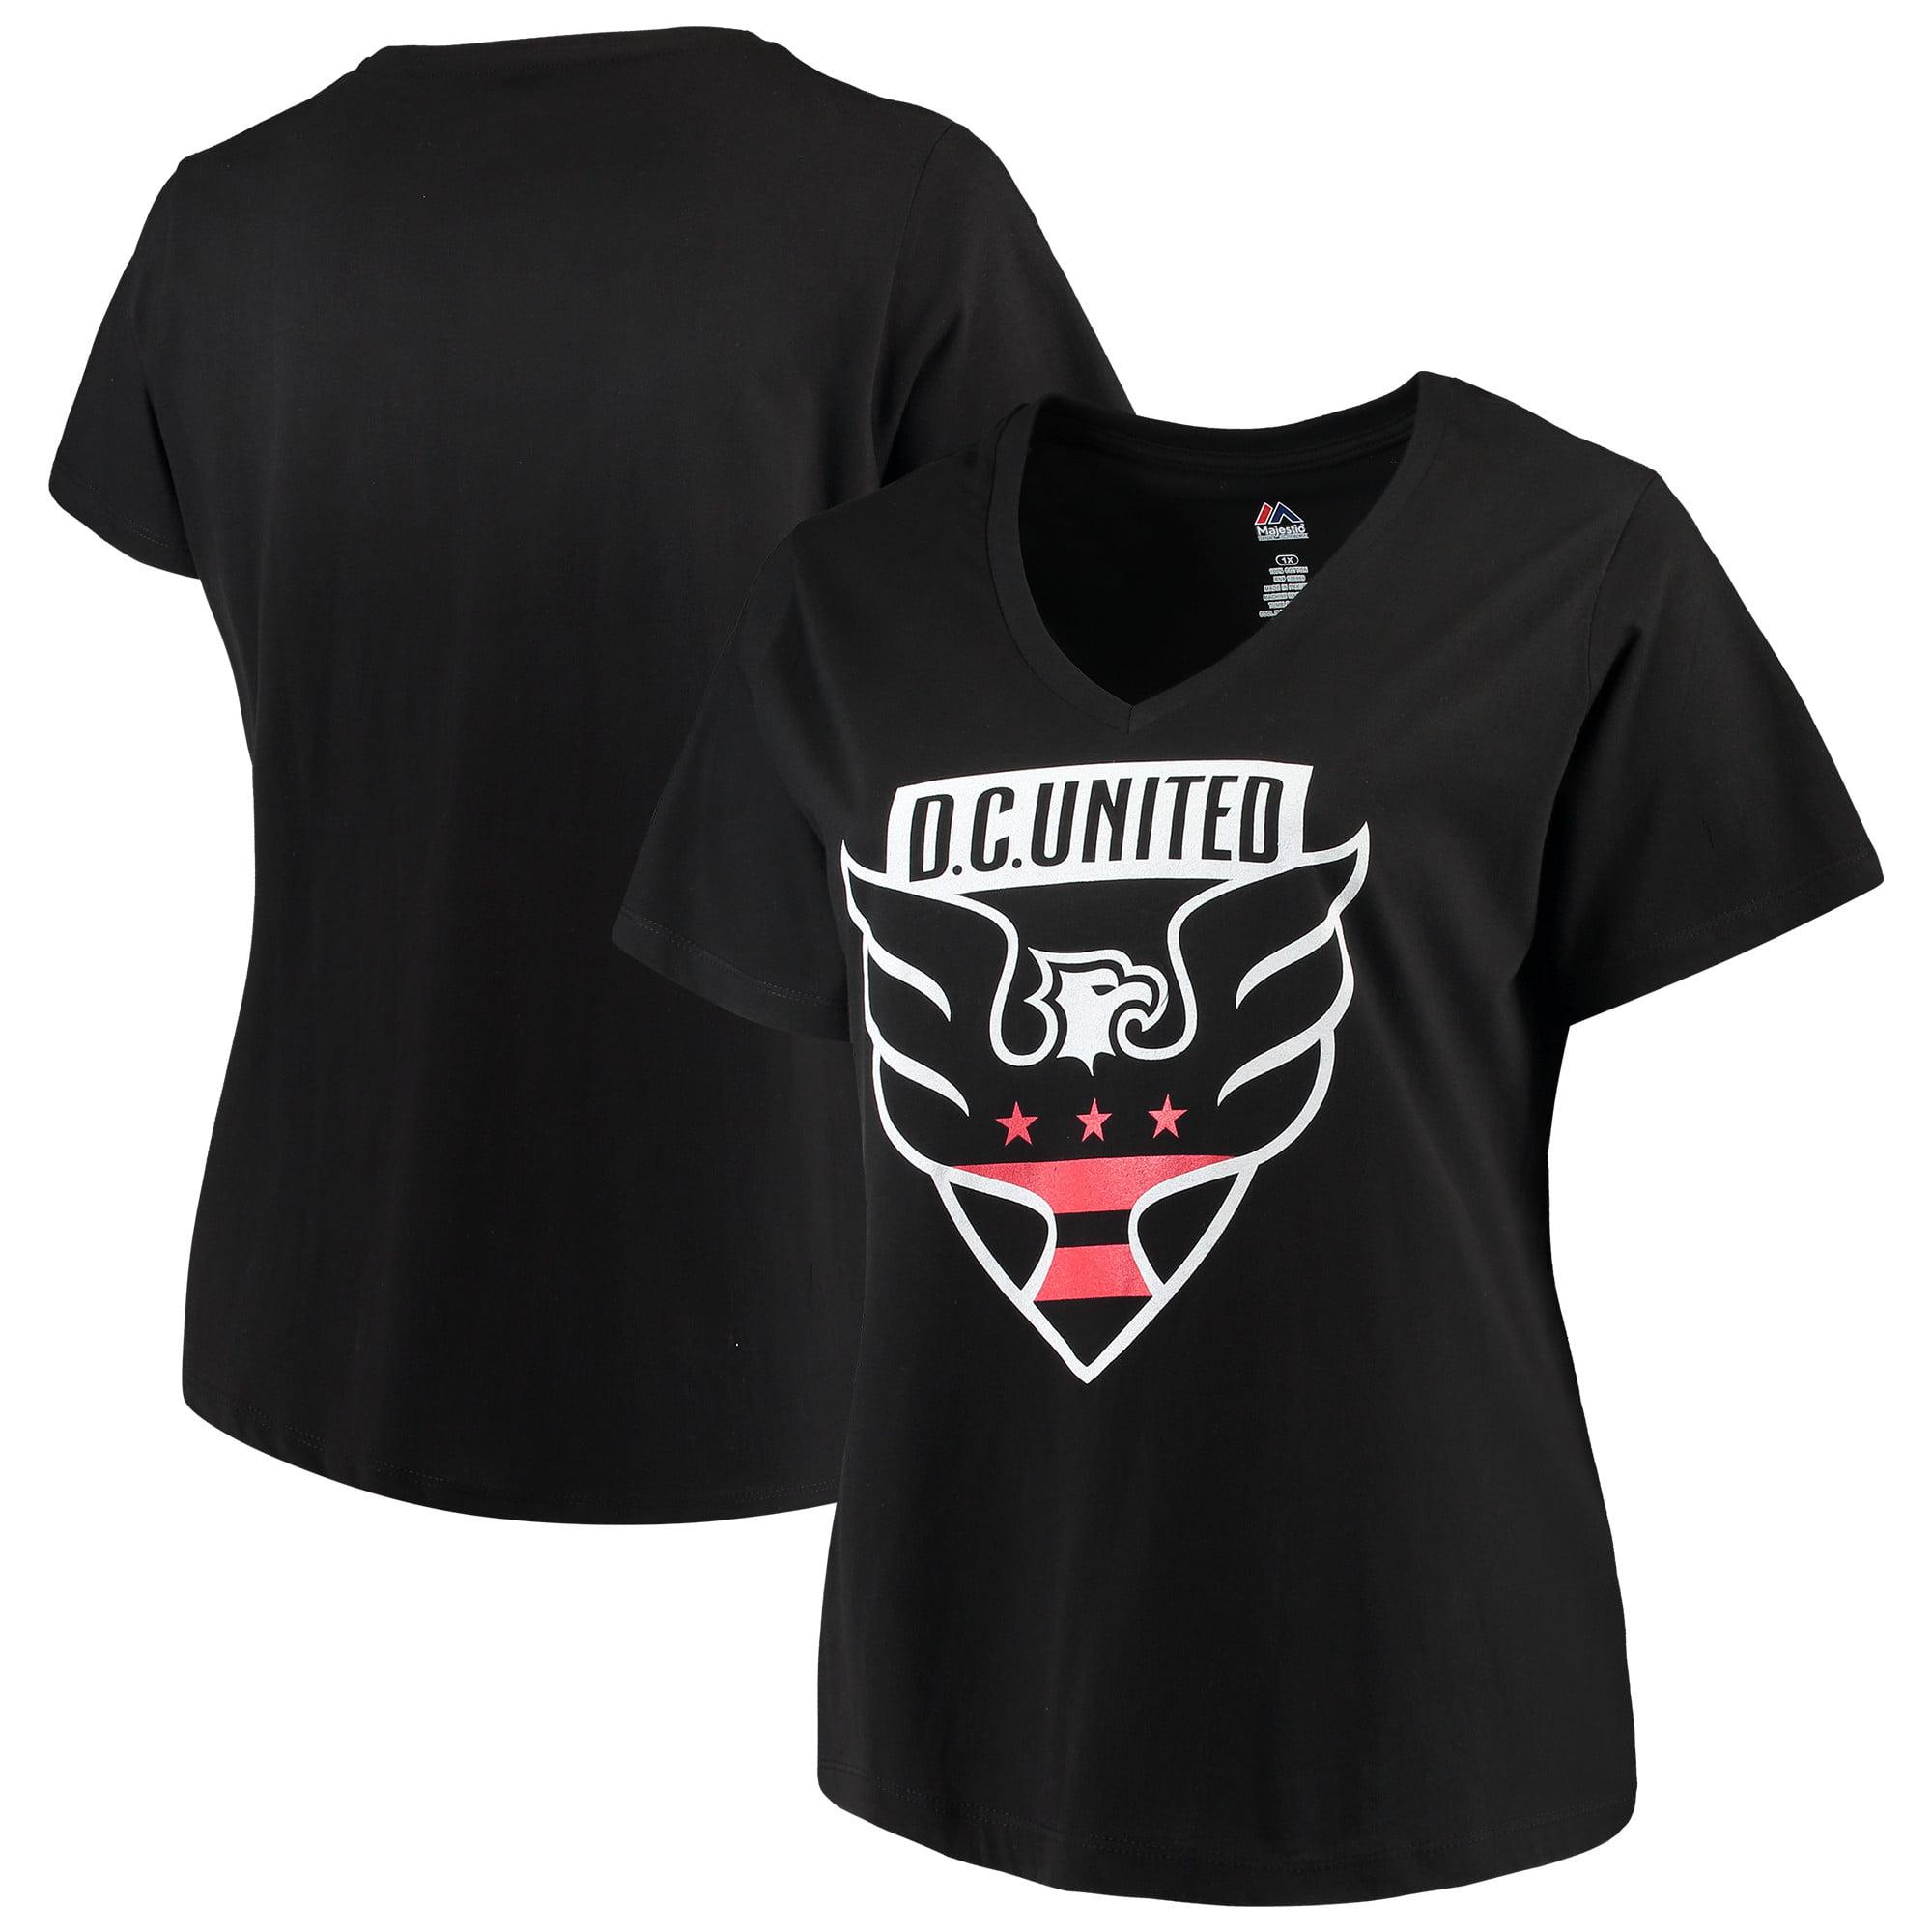 D.C. United Majestic Women's Plus Size Primary V-Neck T-Shirt - Black